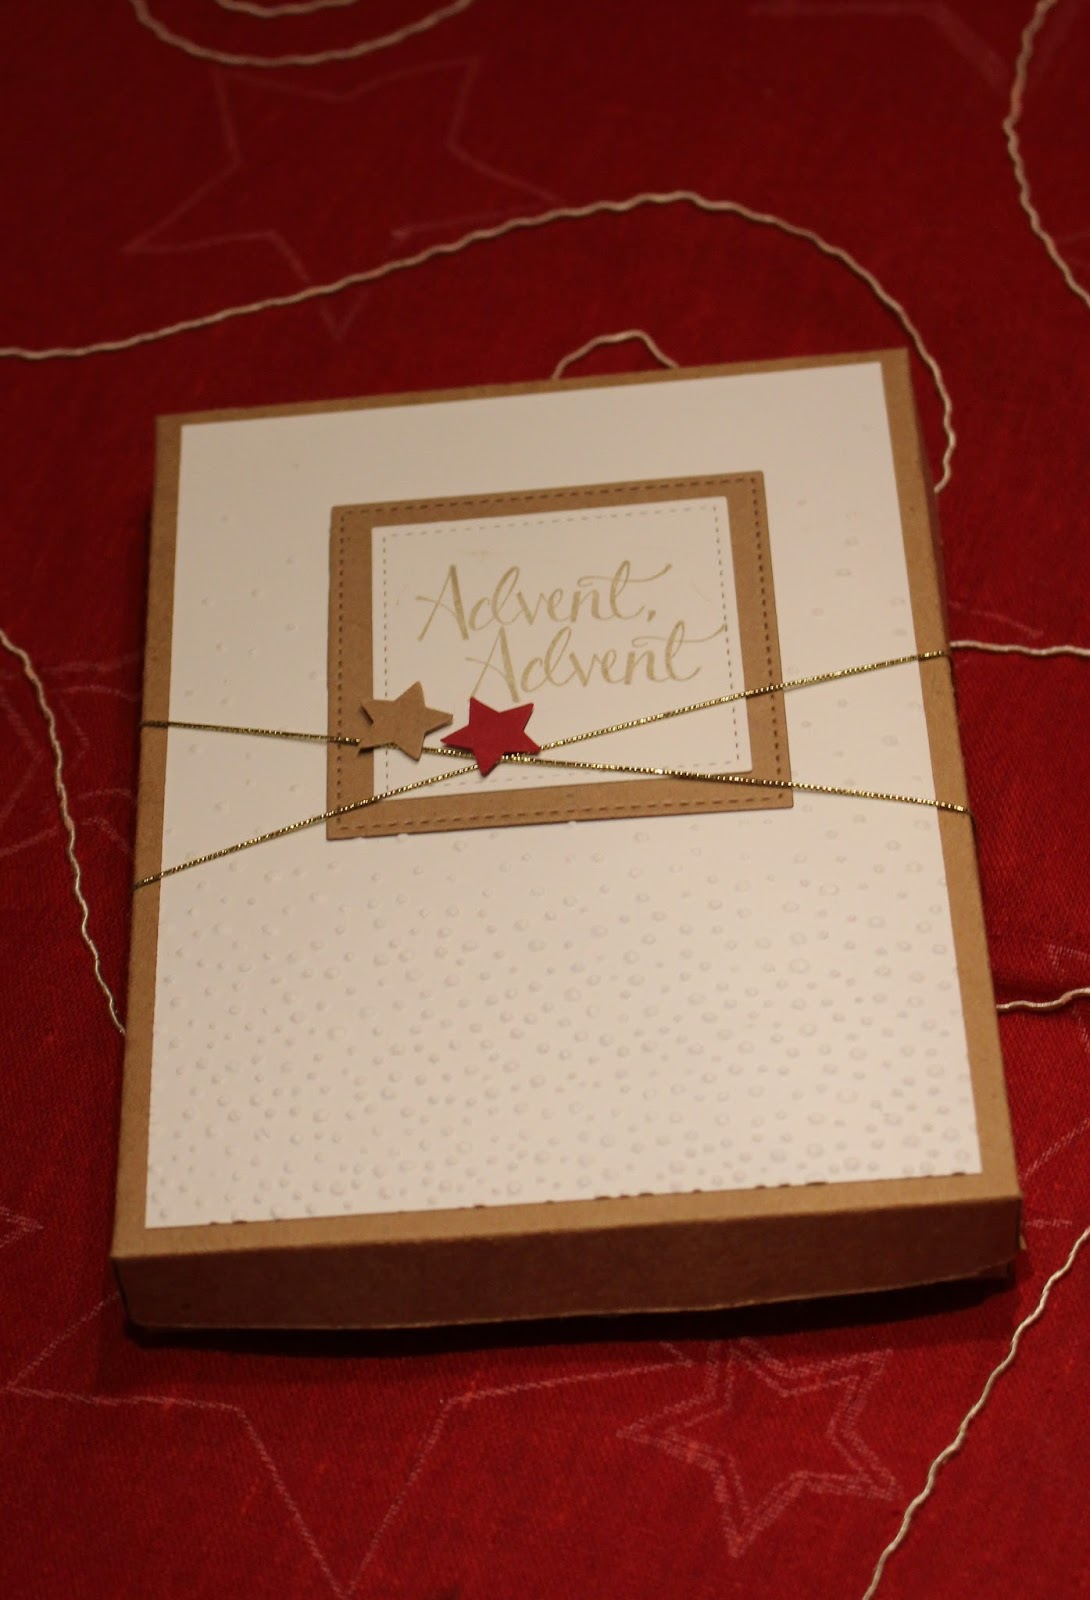 Weihnachtskalender Verschicken.Bely S Kreative Stempelideen